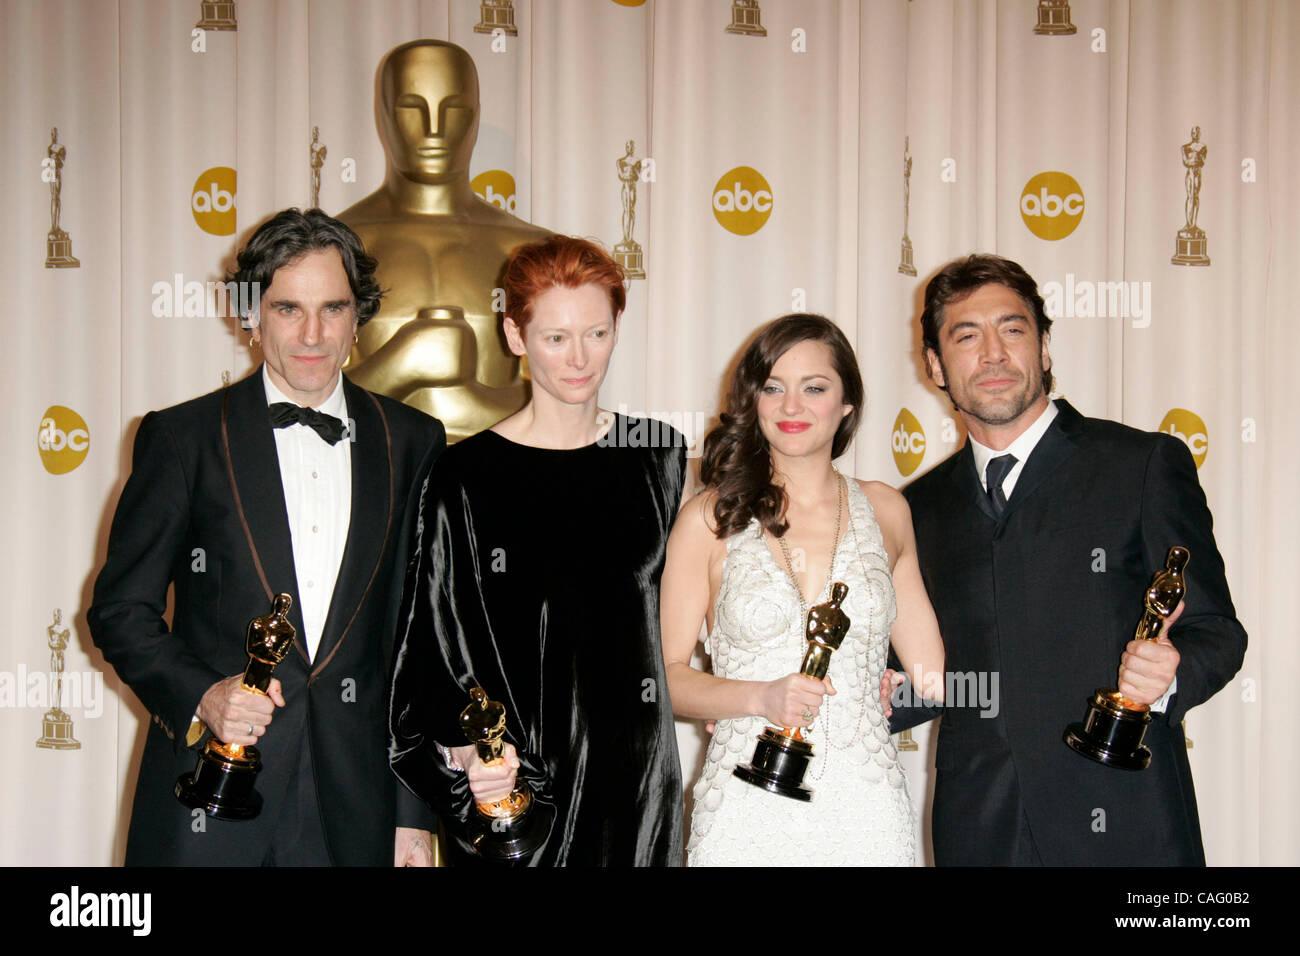 who won best actress 2008